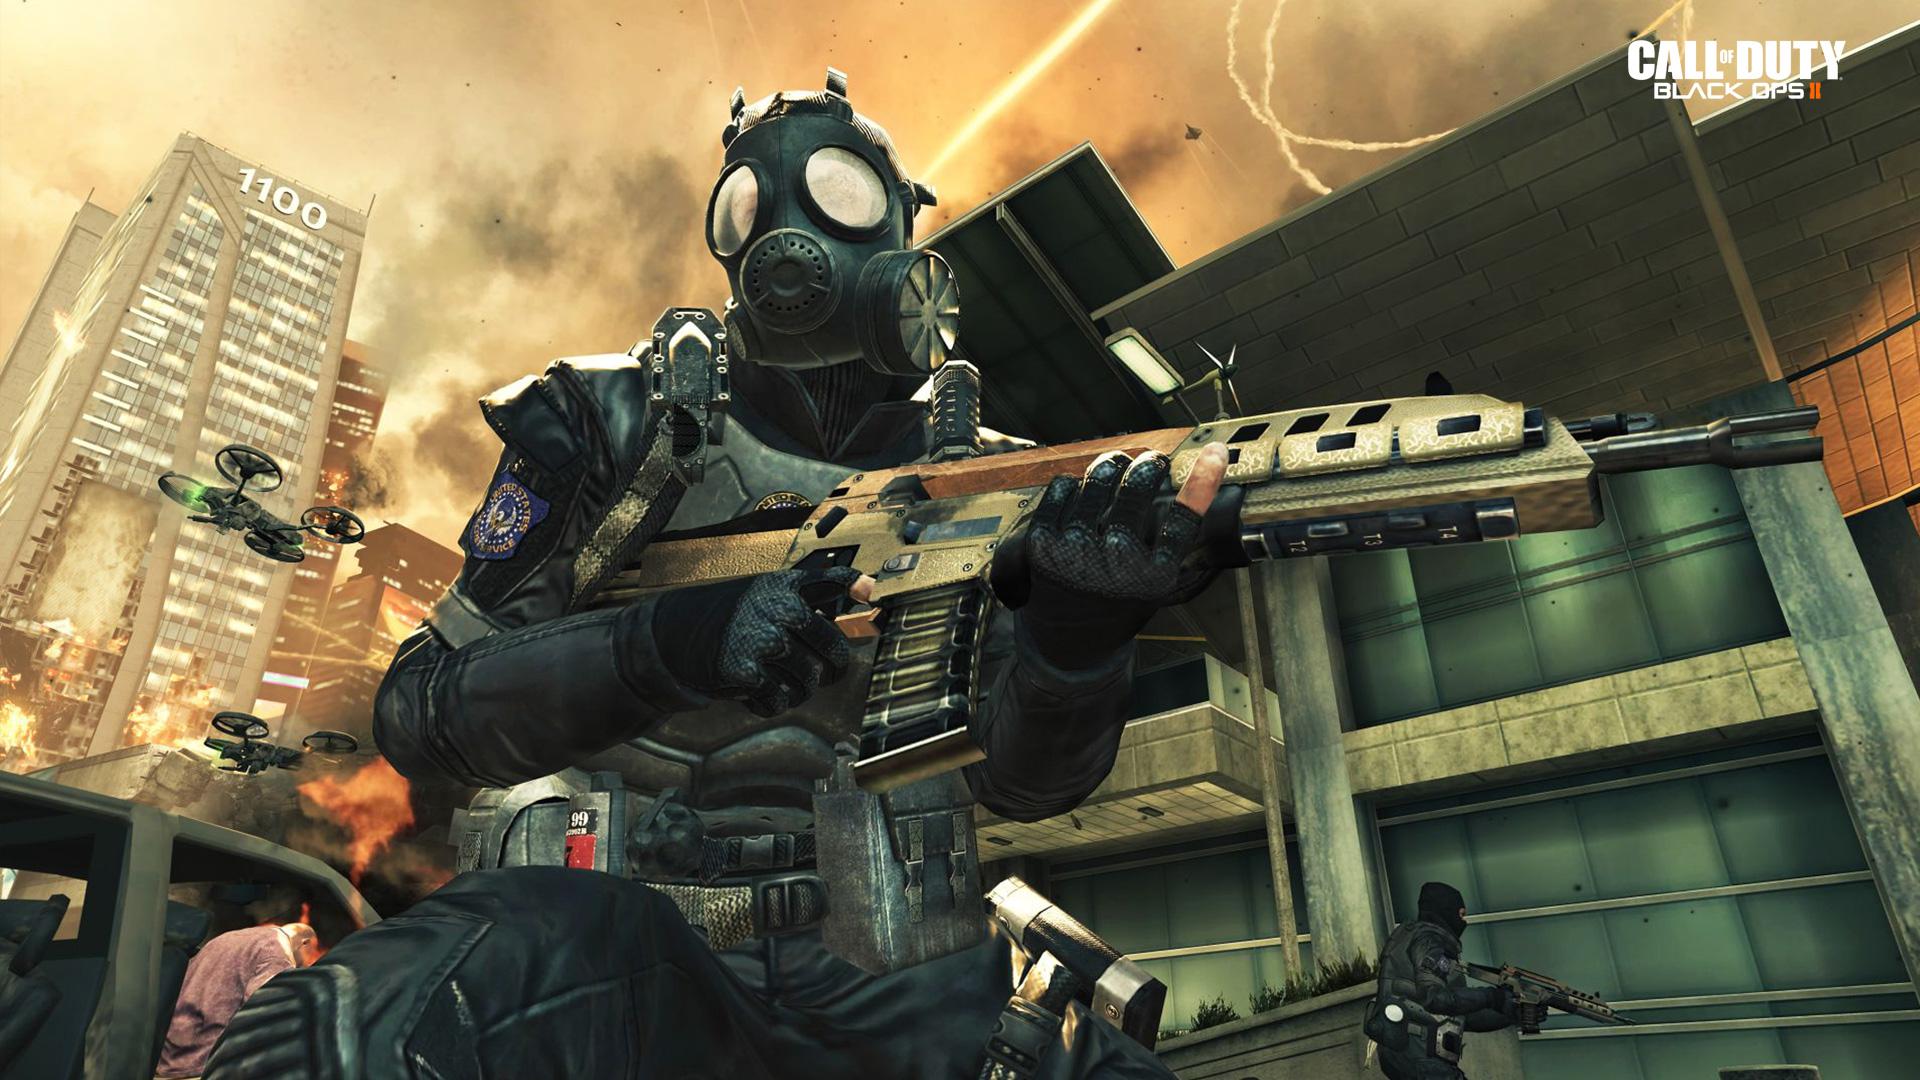 desktop wallpaper hd 1080pCall of Duty Black Ops 2 Wallpaper HD 1080p 1920x1080